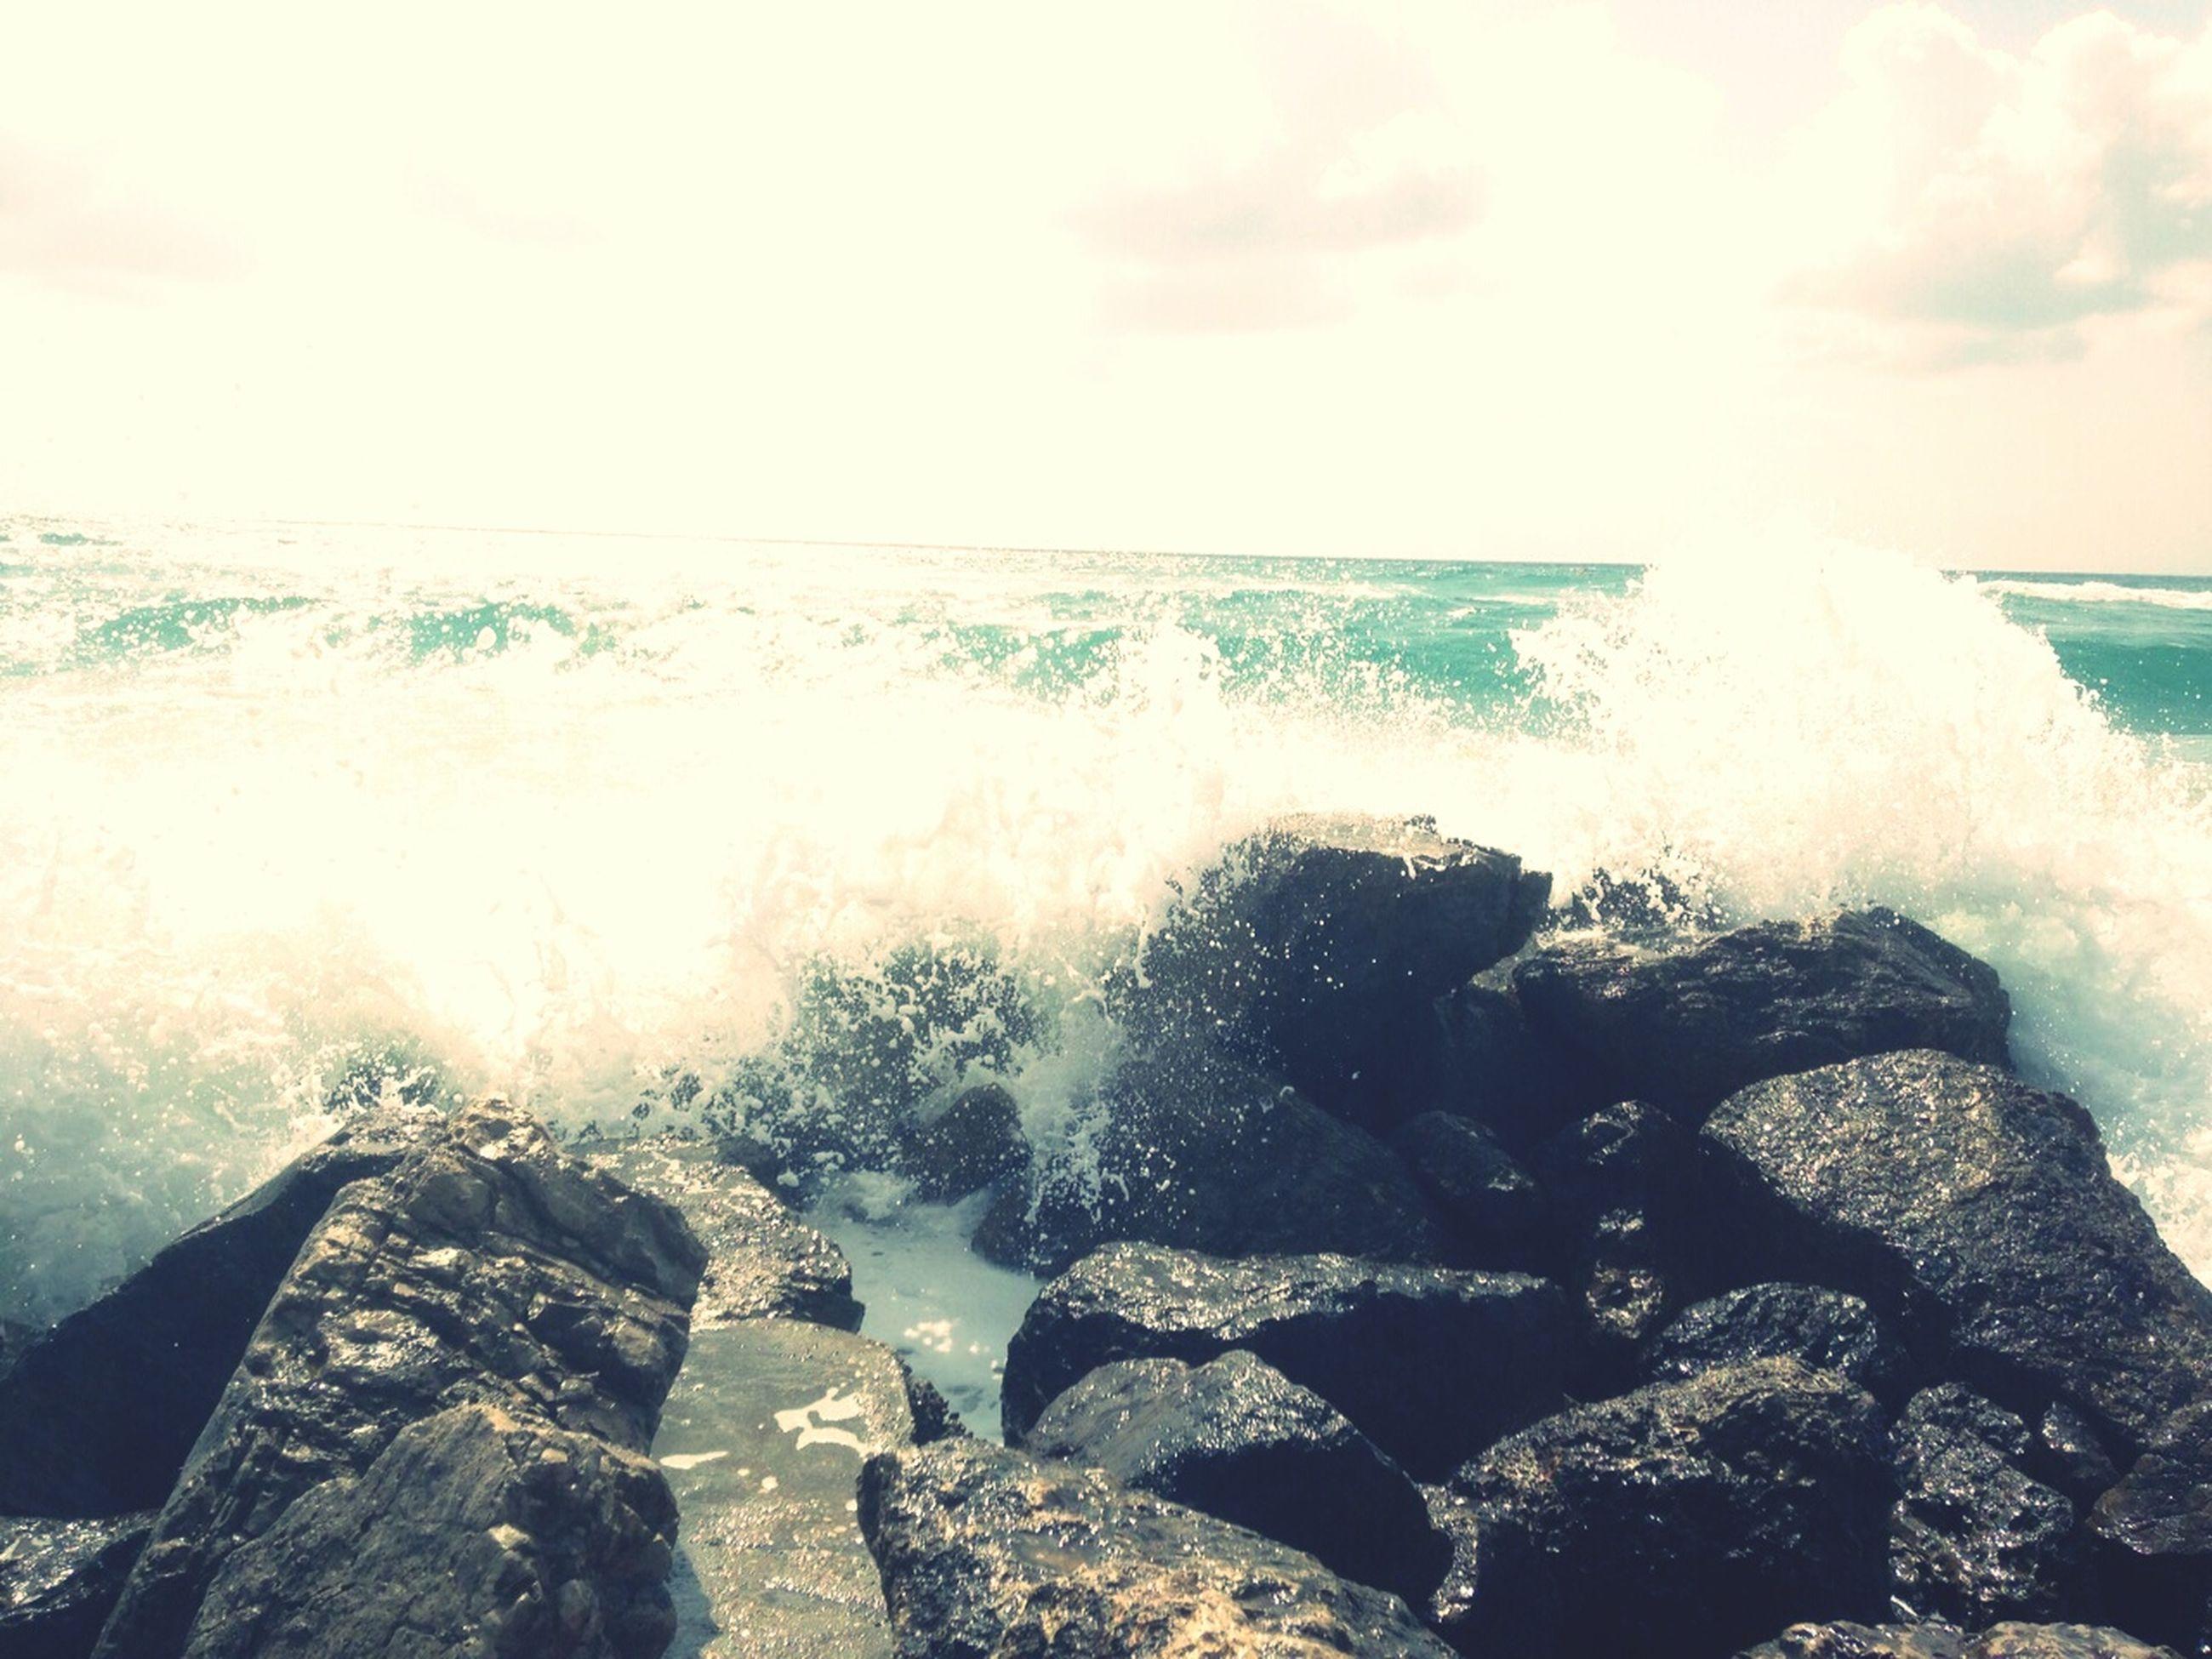 sea, water, horizon over water, rock - object, wave, sky, beauty in nature, scenics, beach, shore, nature, splashing, surf, motion, sunlight, sunbeam, sun, lifestyles, leisure activity